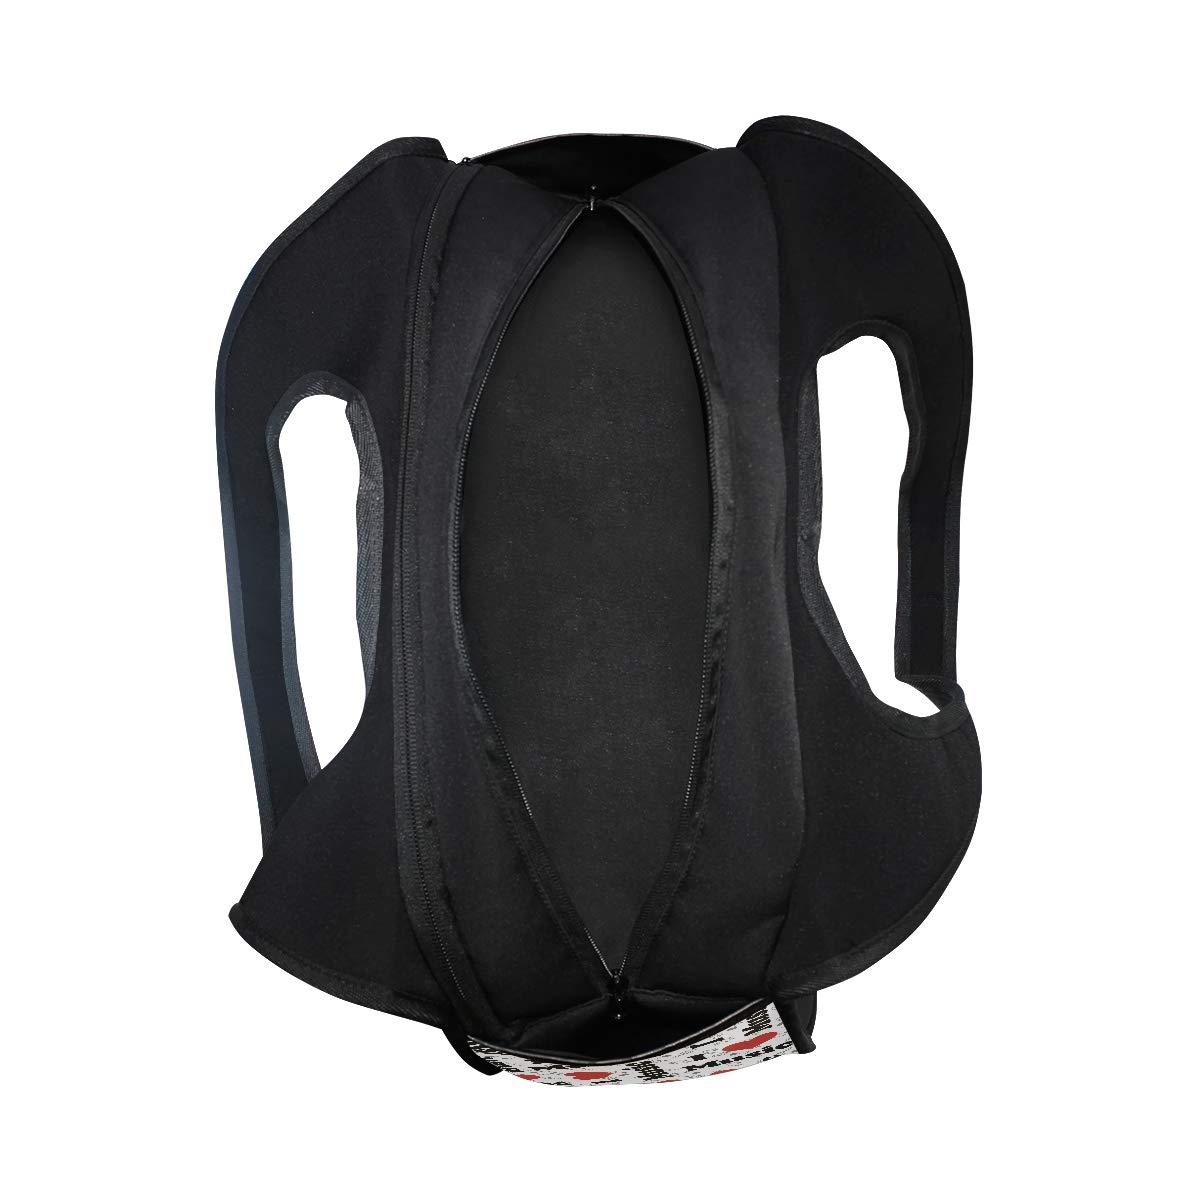 Unisex Travel Duffels Gym Bag Music Note Heart Canvas Weekender Bag Shoulder Bag Totes bags